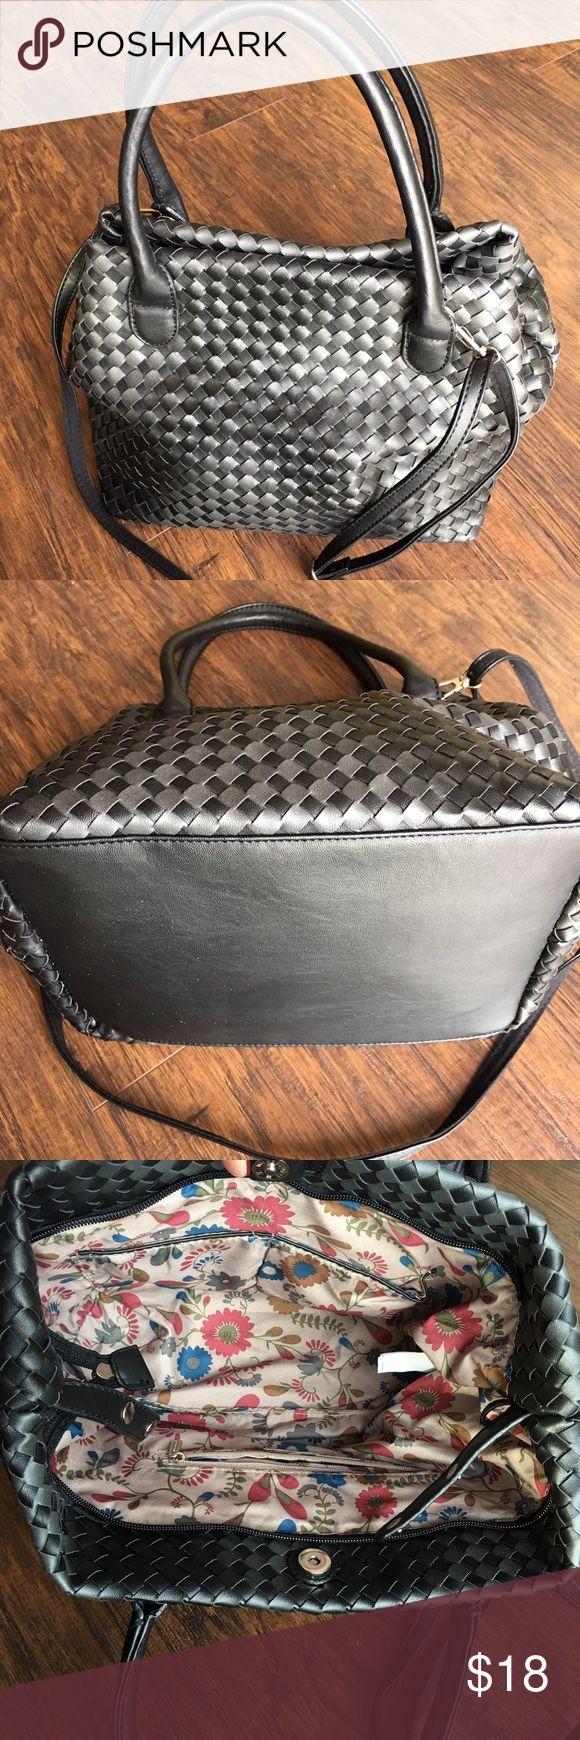 "Vegan Leather ""David Jones, Paris"" Handbag Brown woven faux leather bag. Crossbody strap that can be removed. Beautiful Floral satin like lining snap and magnetic closure NWOT David Jones Bags Satchels"